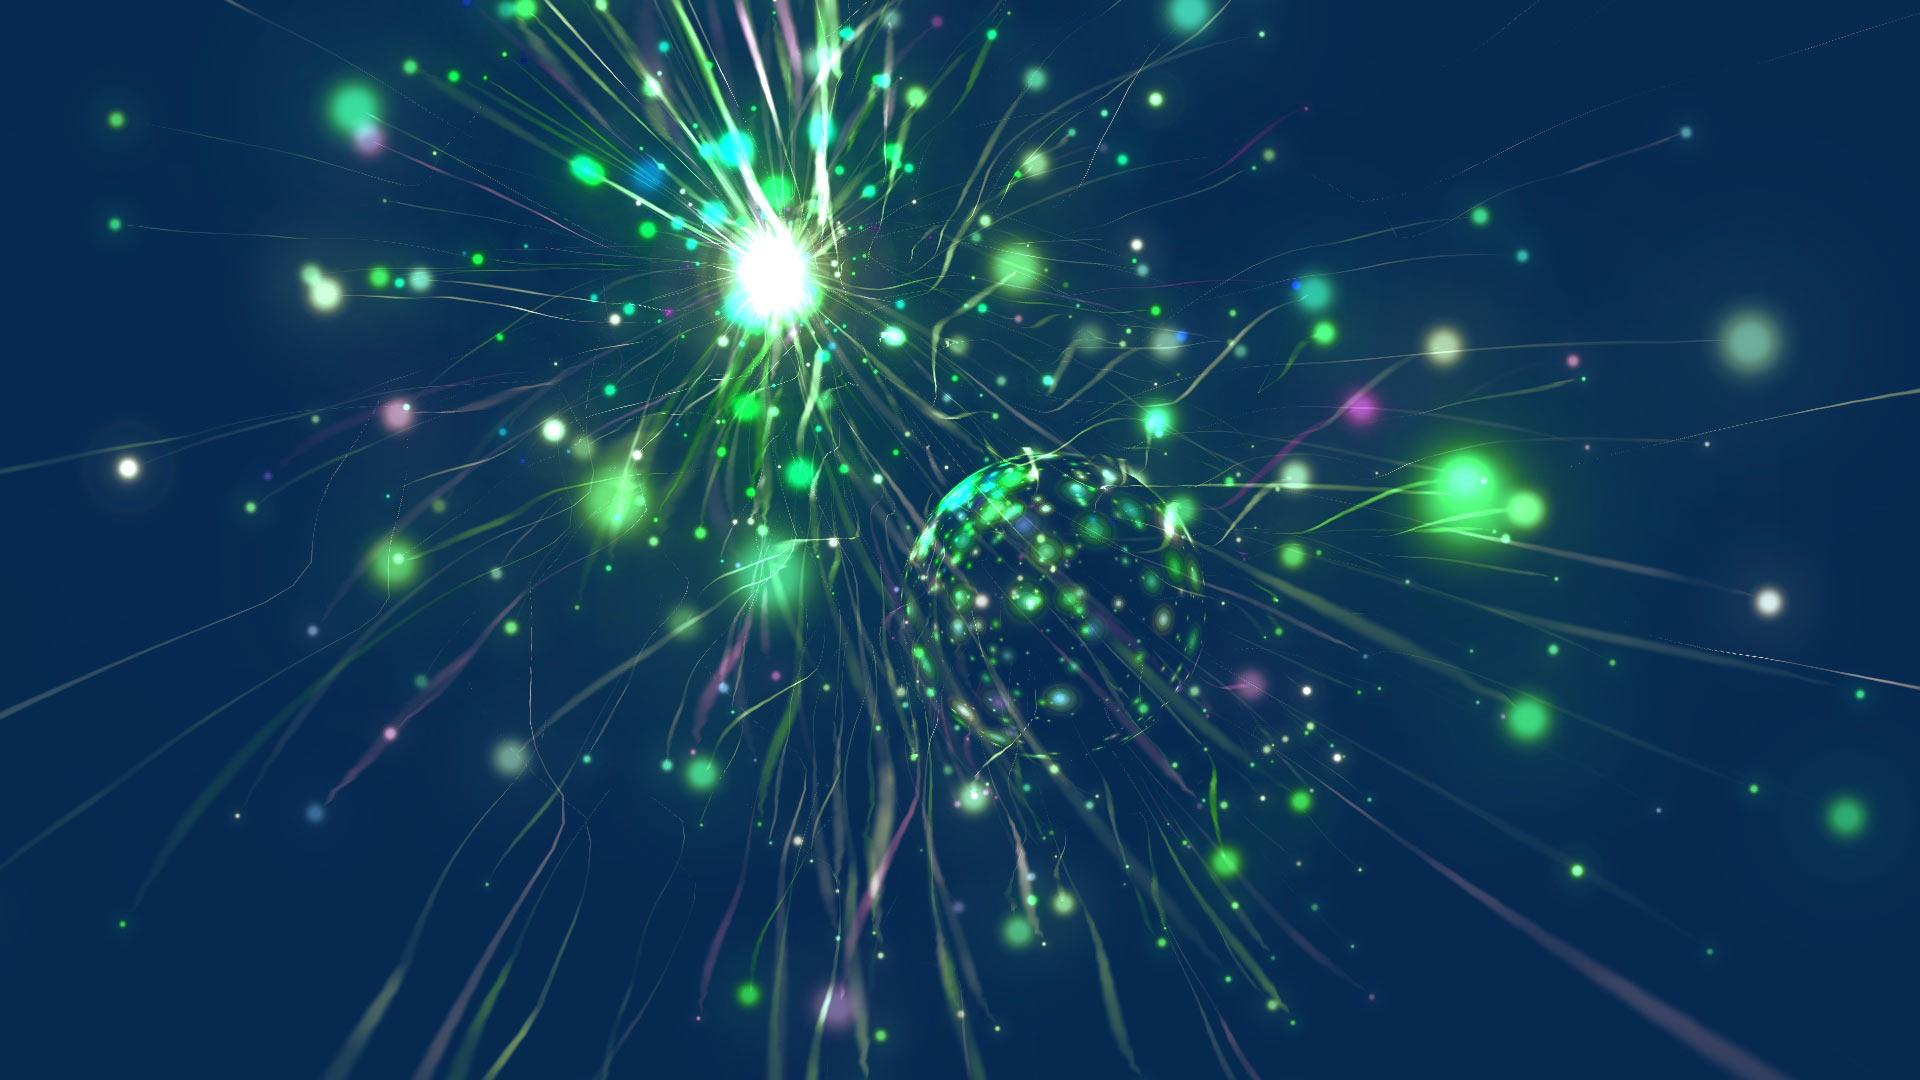 image_7892e-X17-Particle.jpg